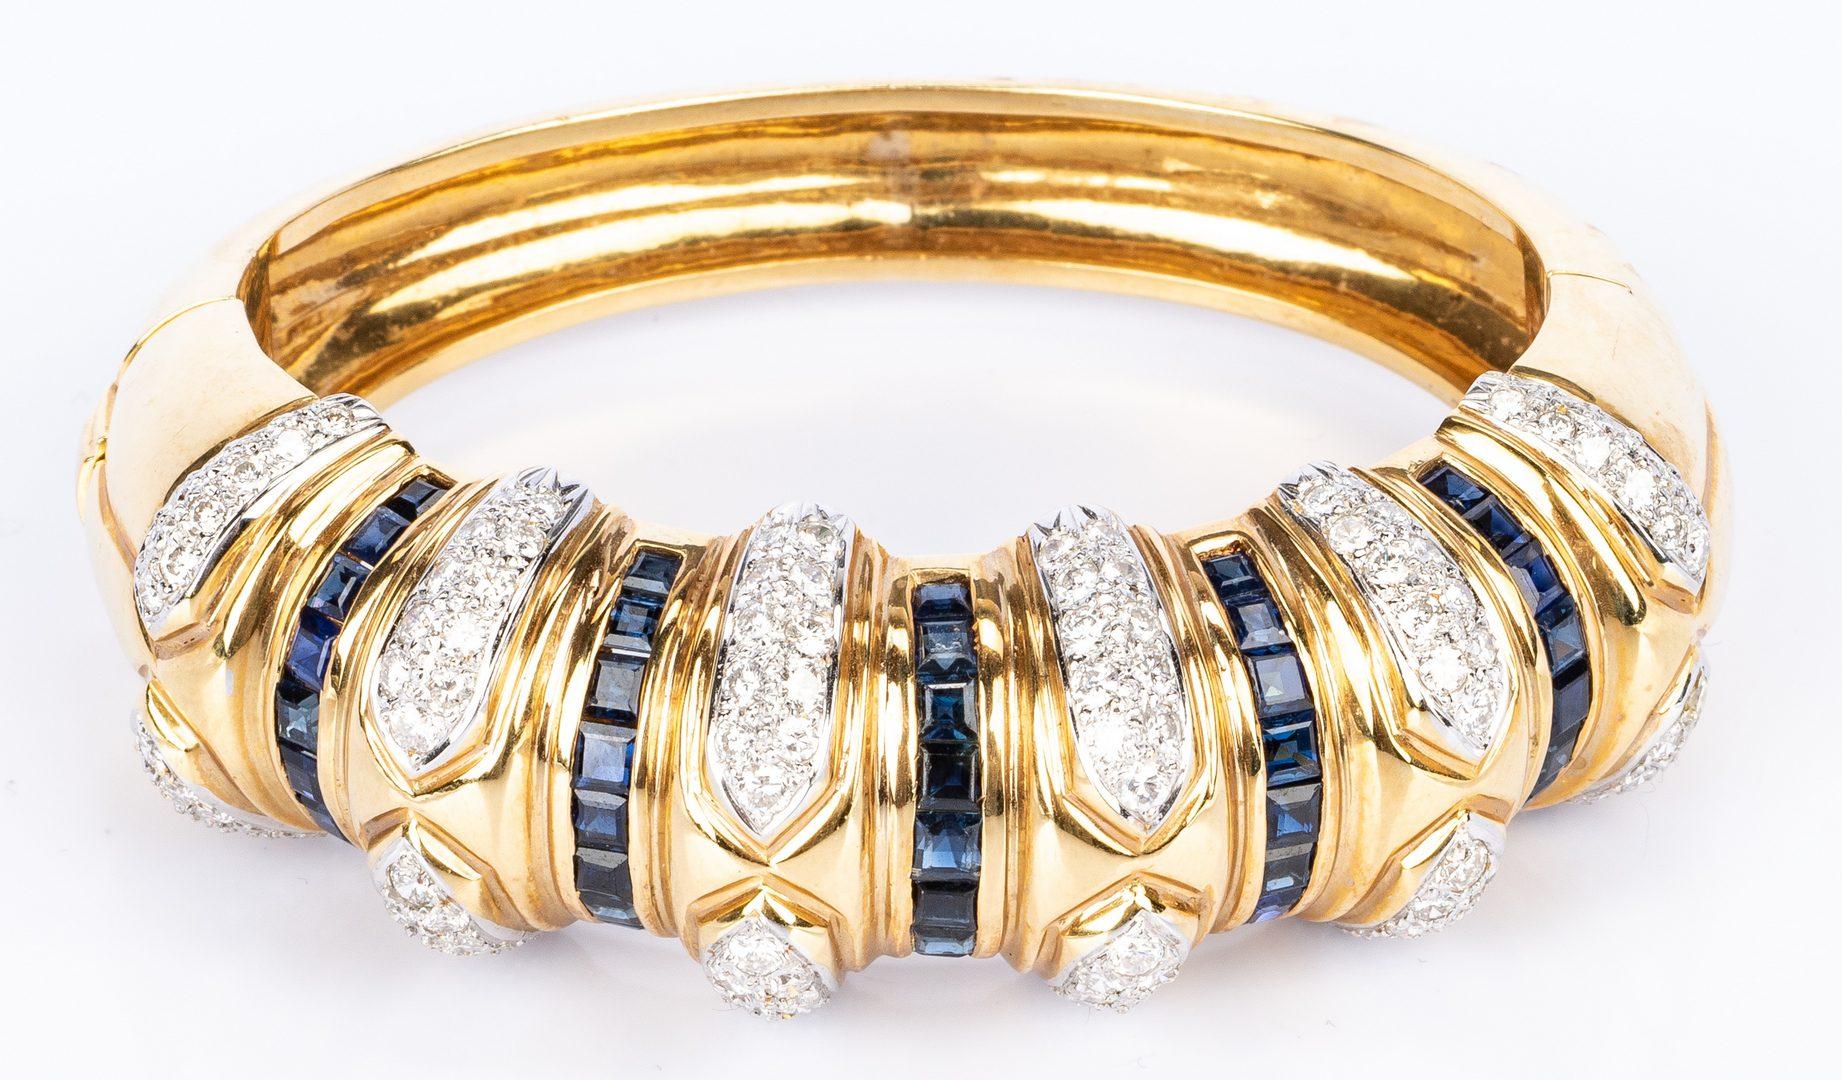 Lot 34: 18K Sapphire Diamond Fashion Bangle Bracelet